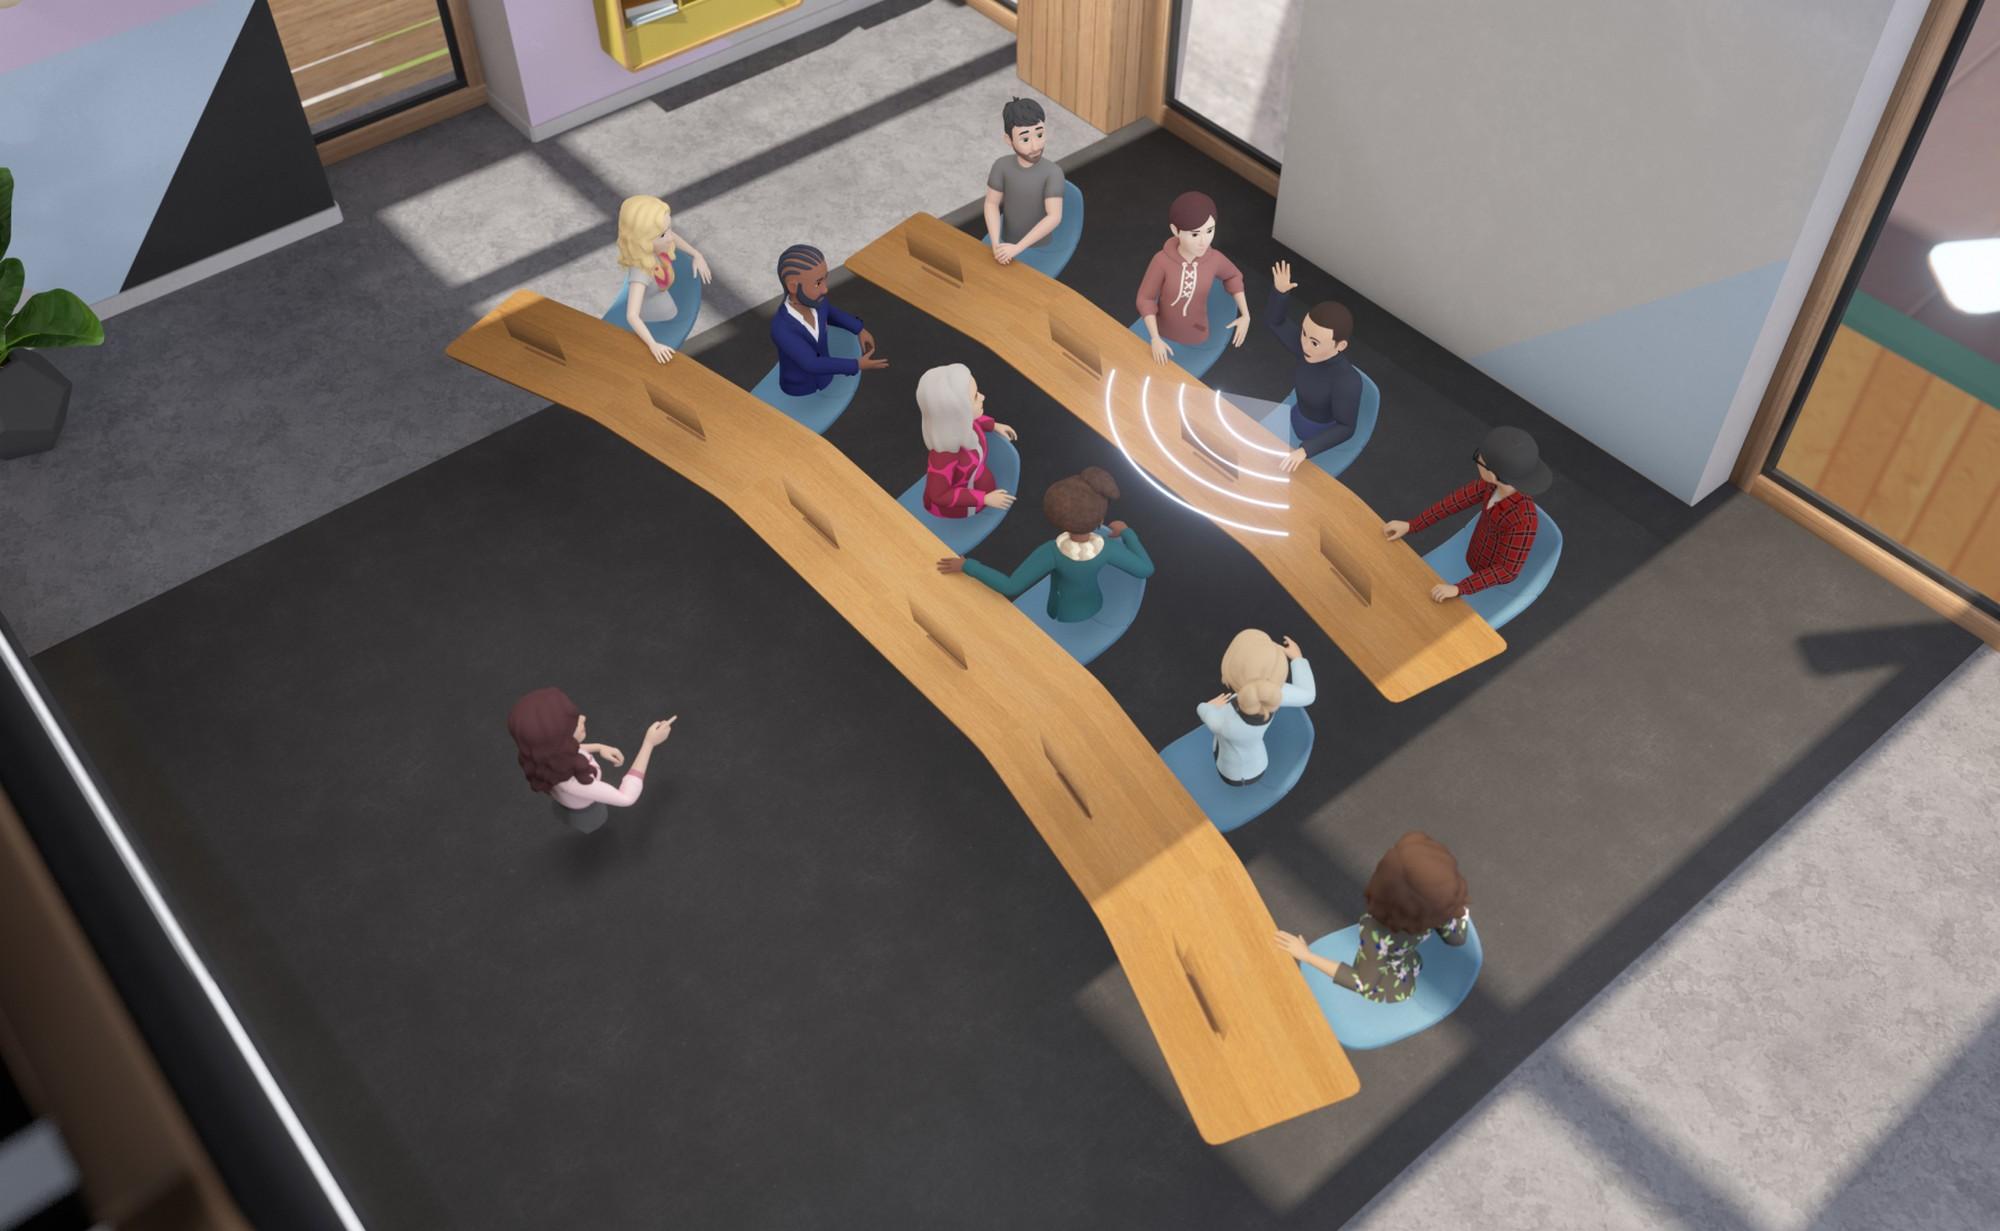 Facebook Announces Workrooms, a Collaborative VR Space